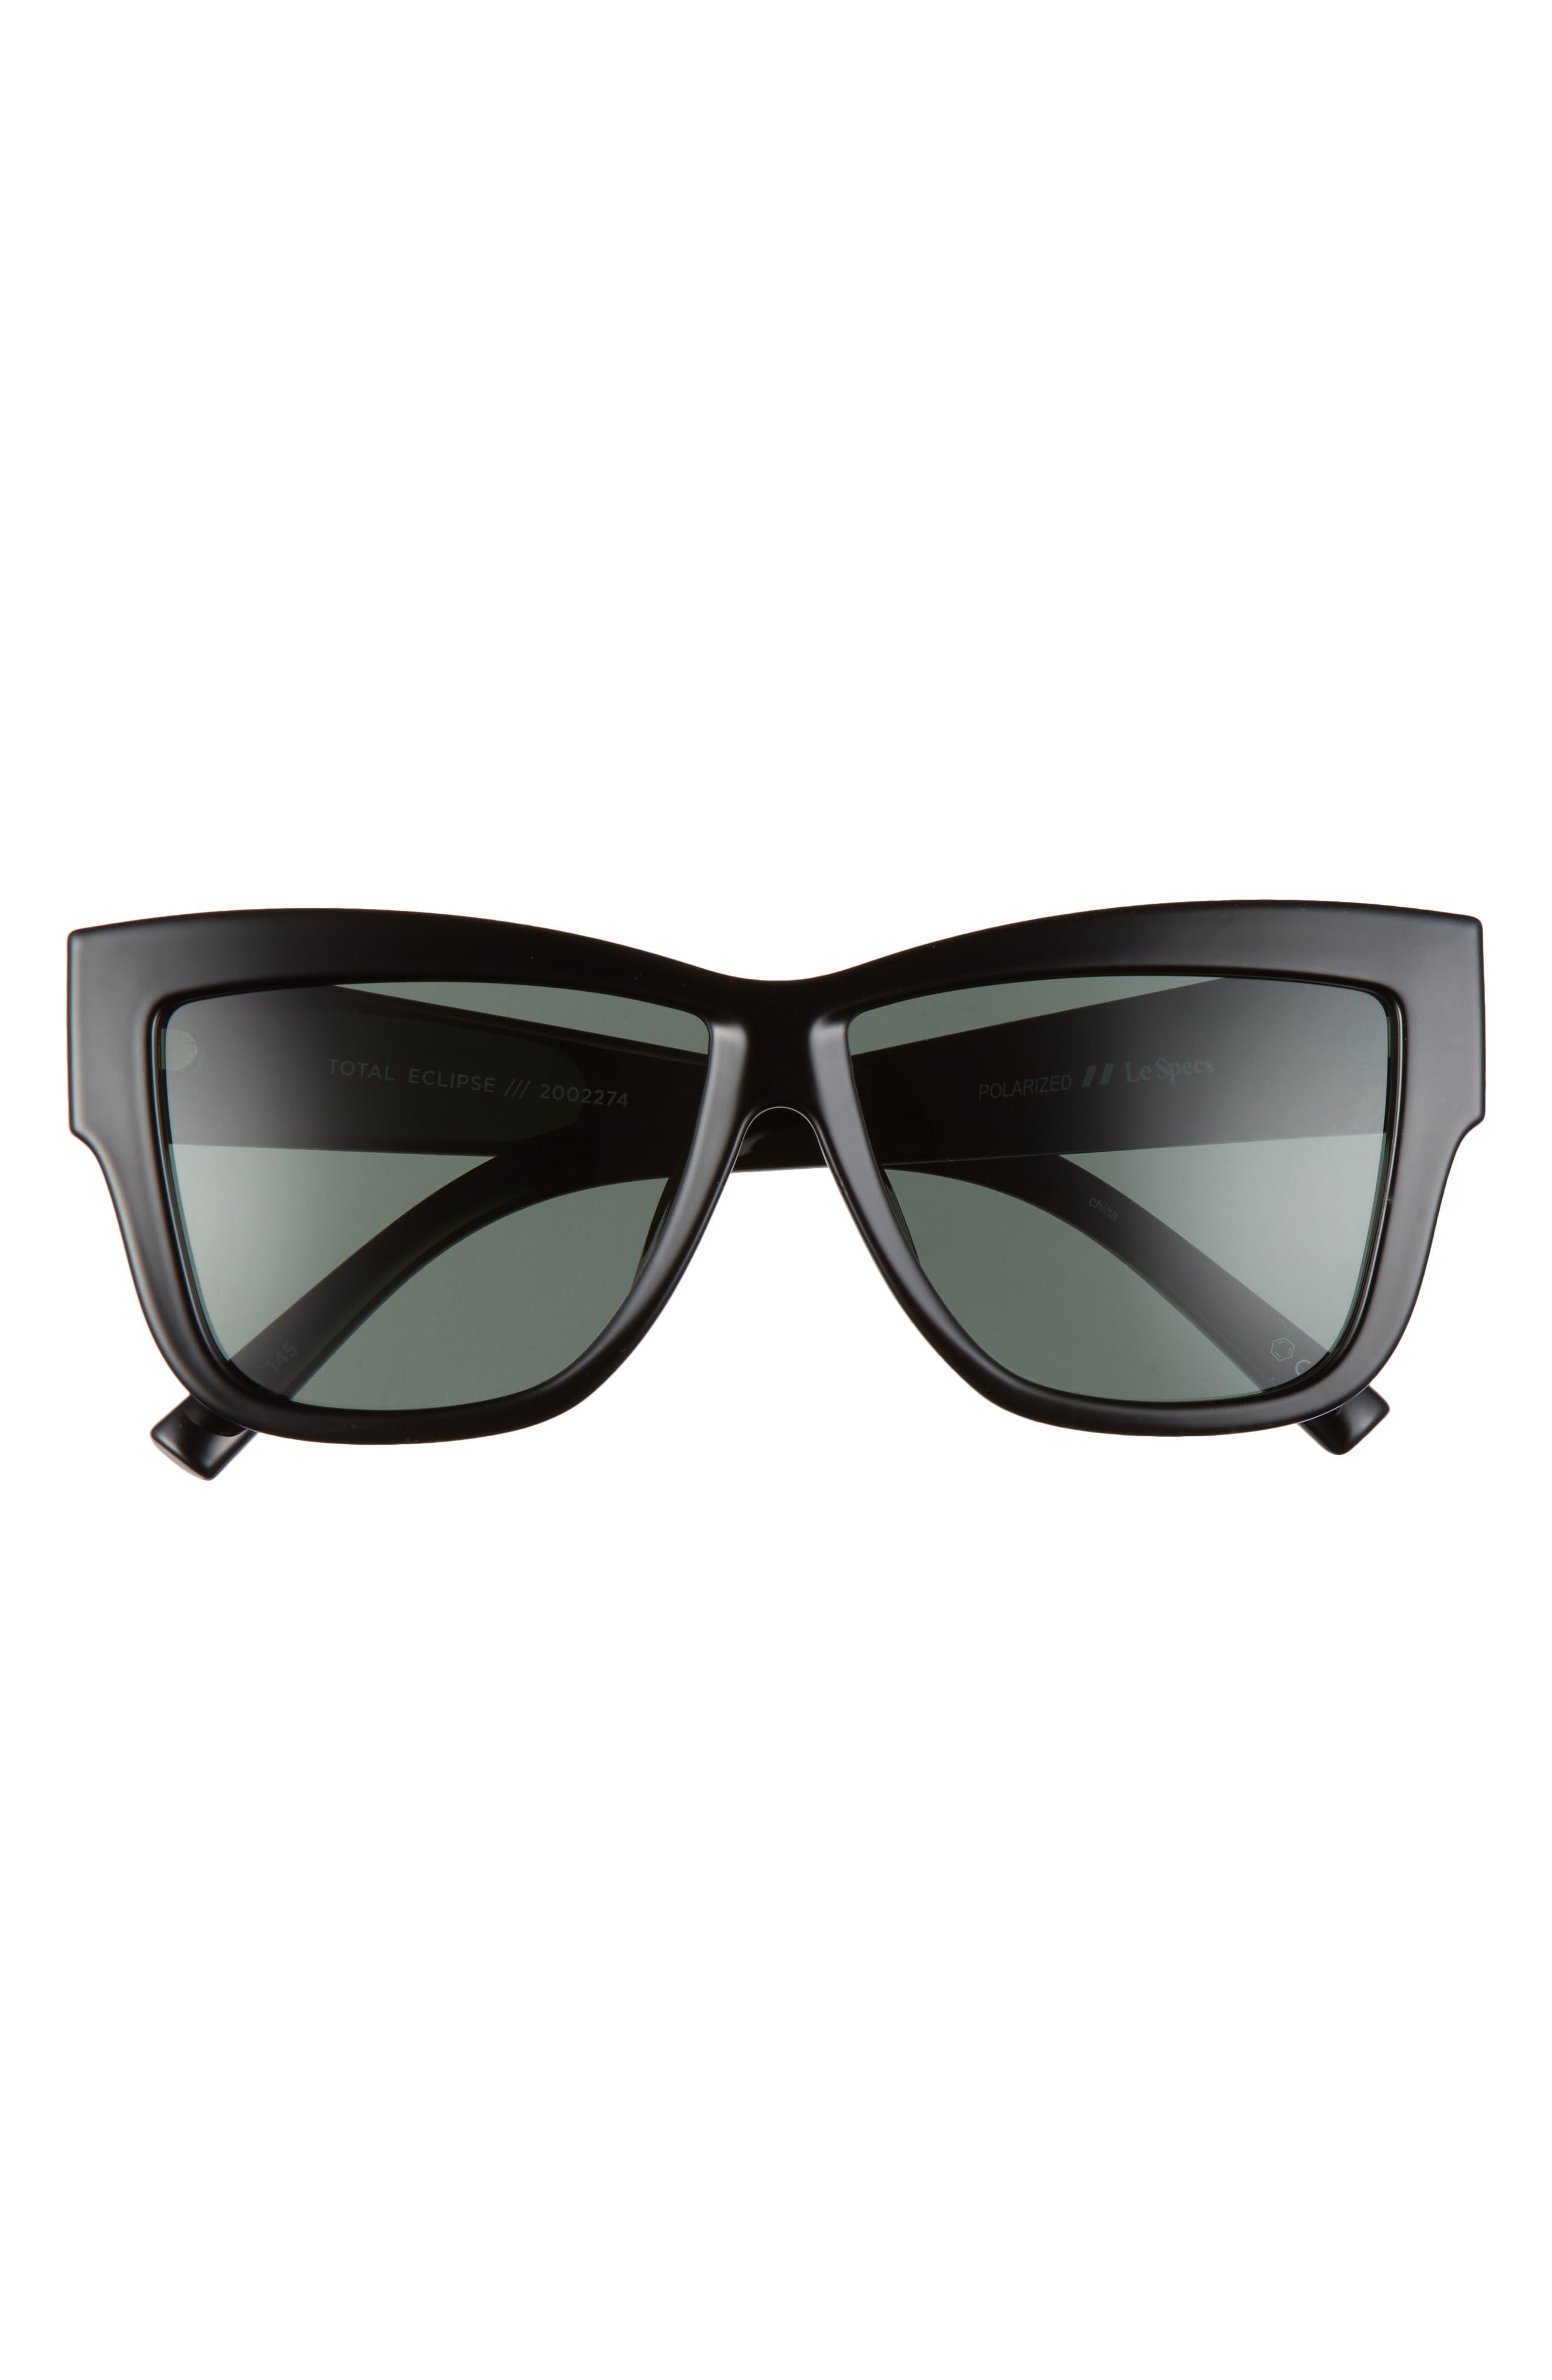 Eclipse 57mm Sunglasses